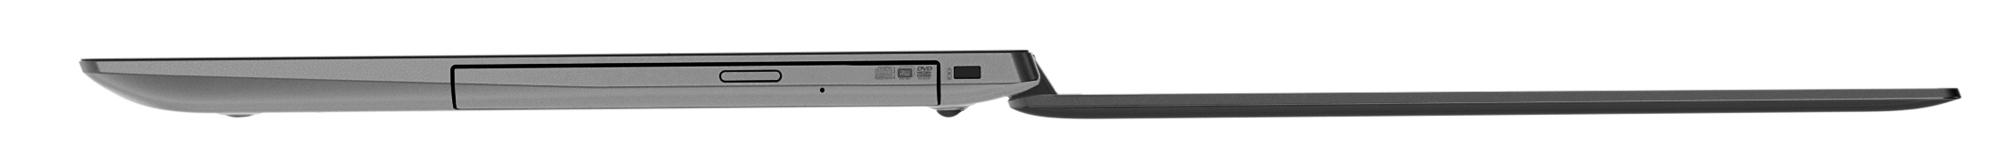 Фото  Ноутбук Lenovo ideapad 330-15 Onyx Black (81DE01FQRA)